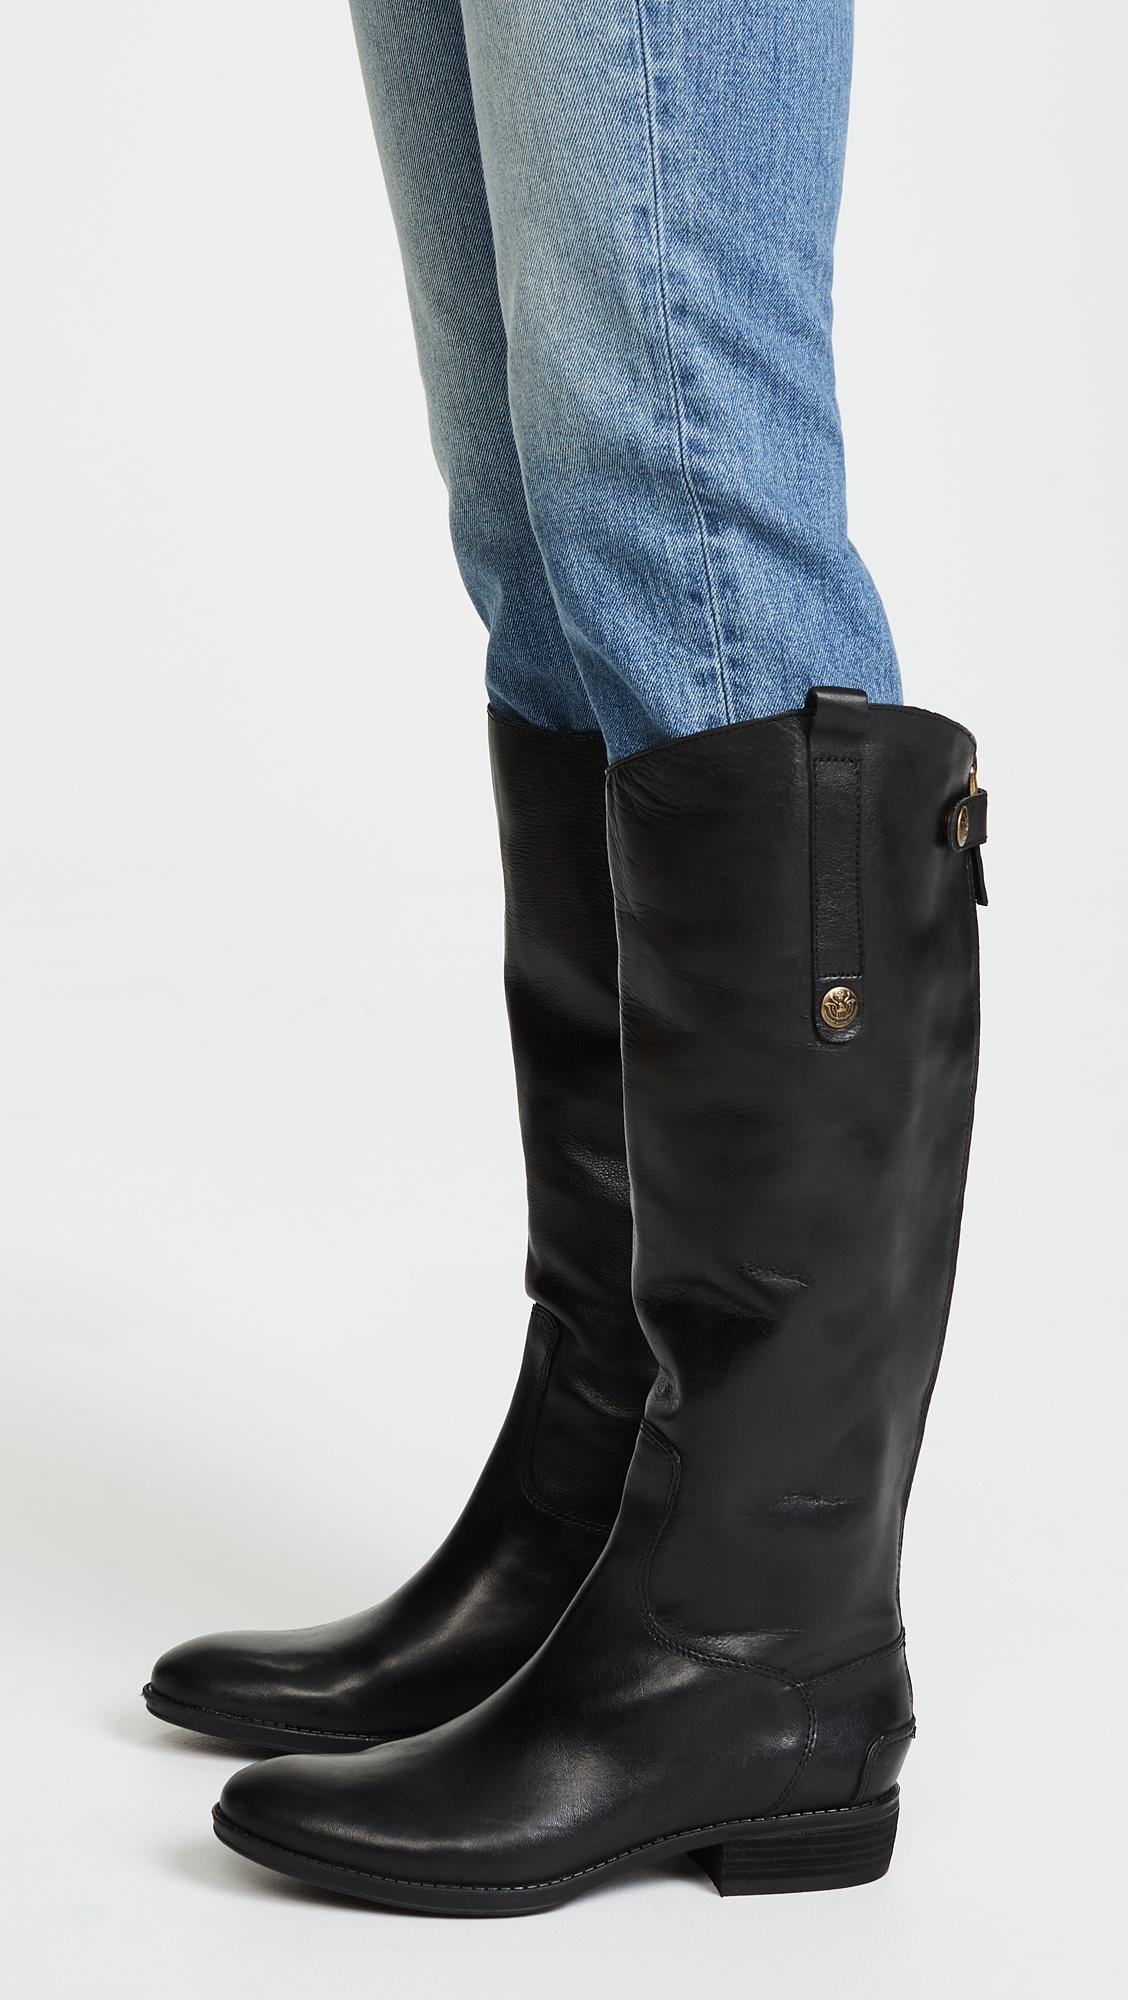 a720a788df0d Sam Edelman Penny Riding Boots